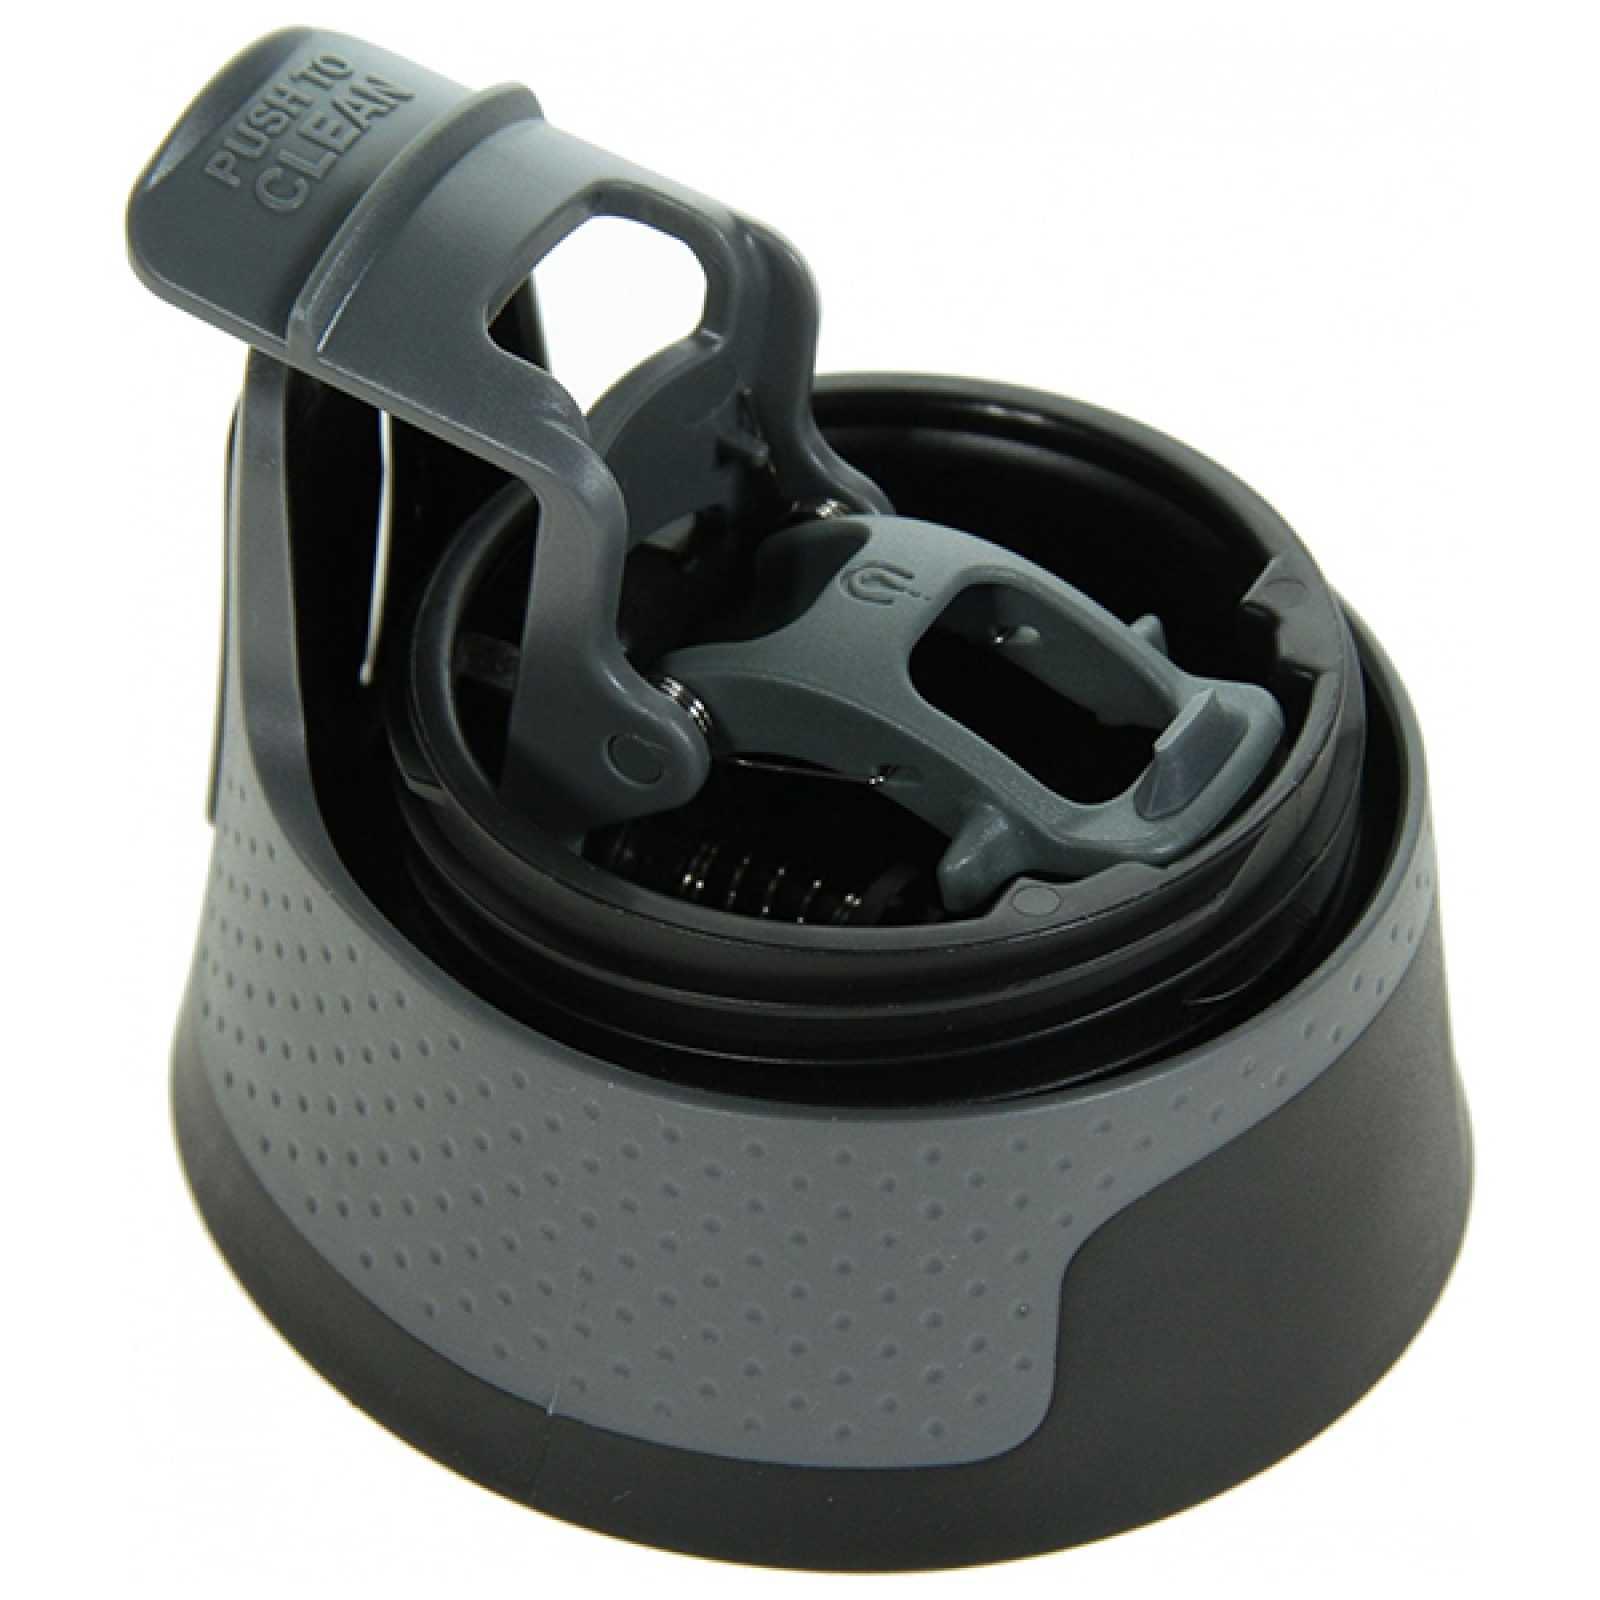 Термостакан Contigo WEST LOOP, объем 0,47 л, серый Contigo 2095832 фото 1